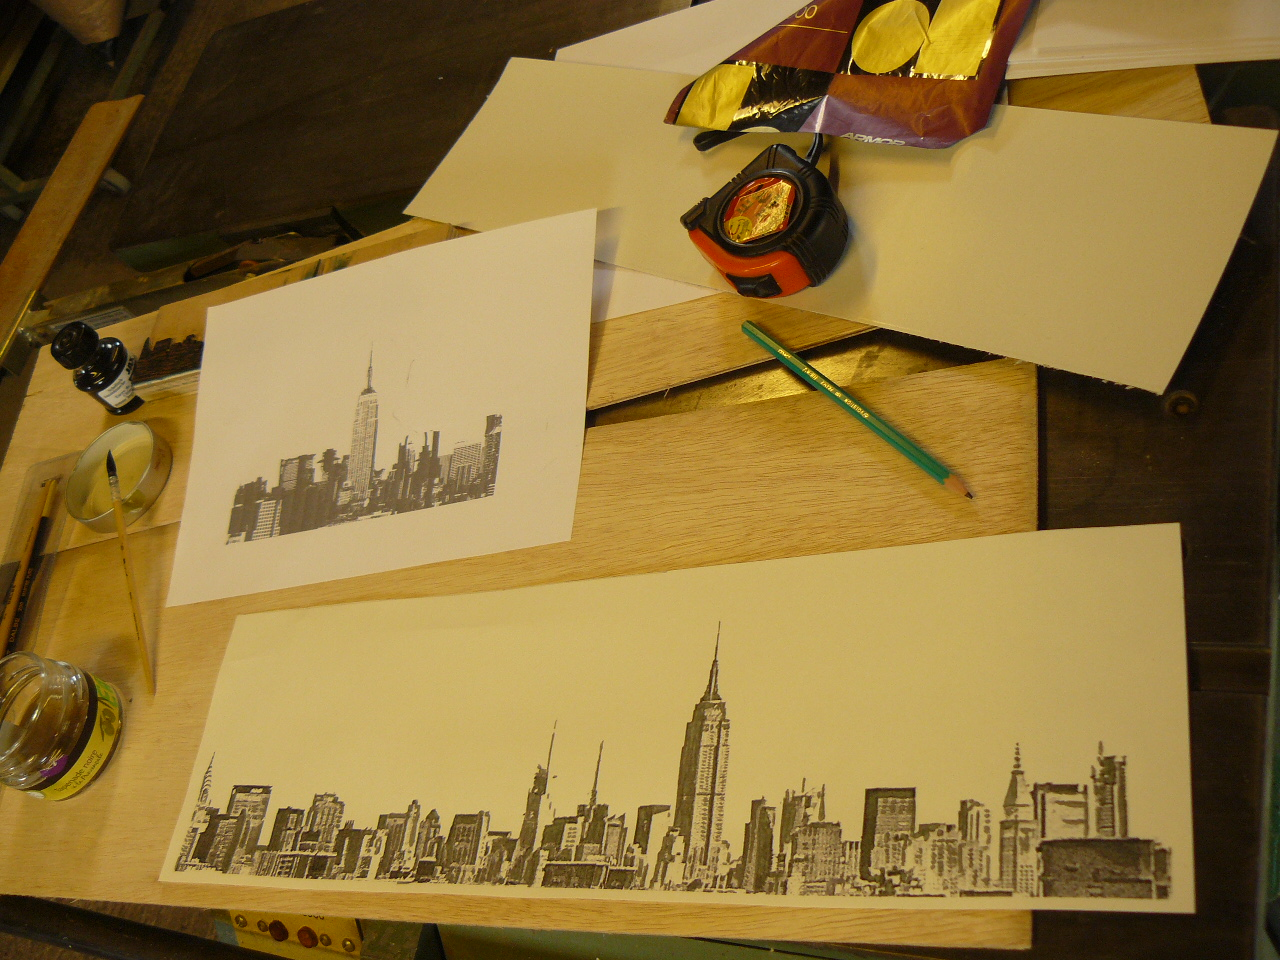 bois grav new york woodcut new york jean pierre coasne linogravure linocut. Black Bedroom Furniture Sets. Home Design Ideas